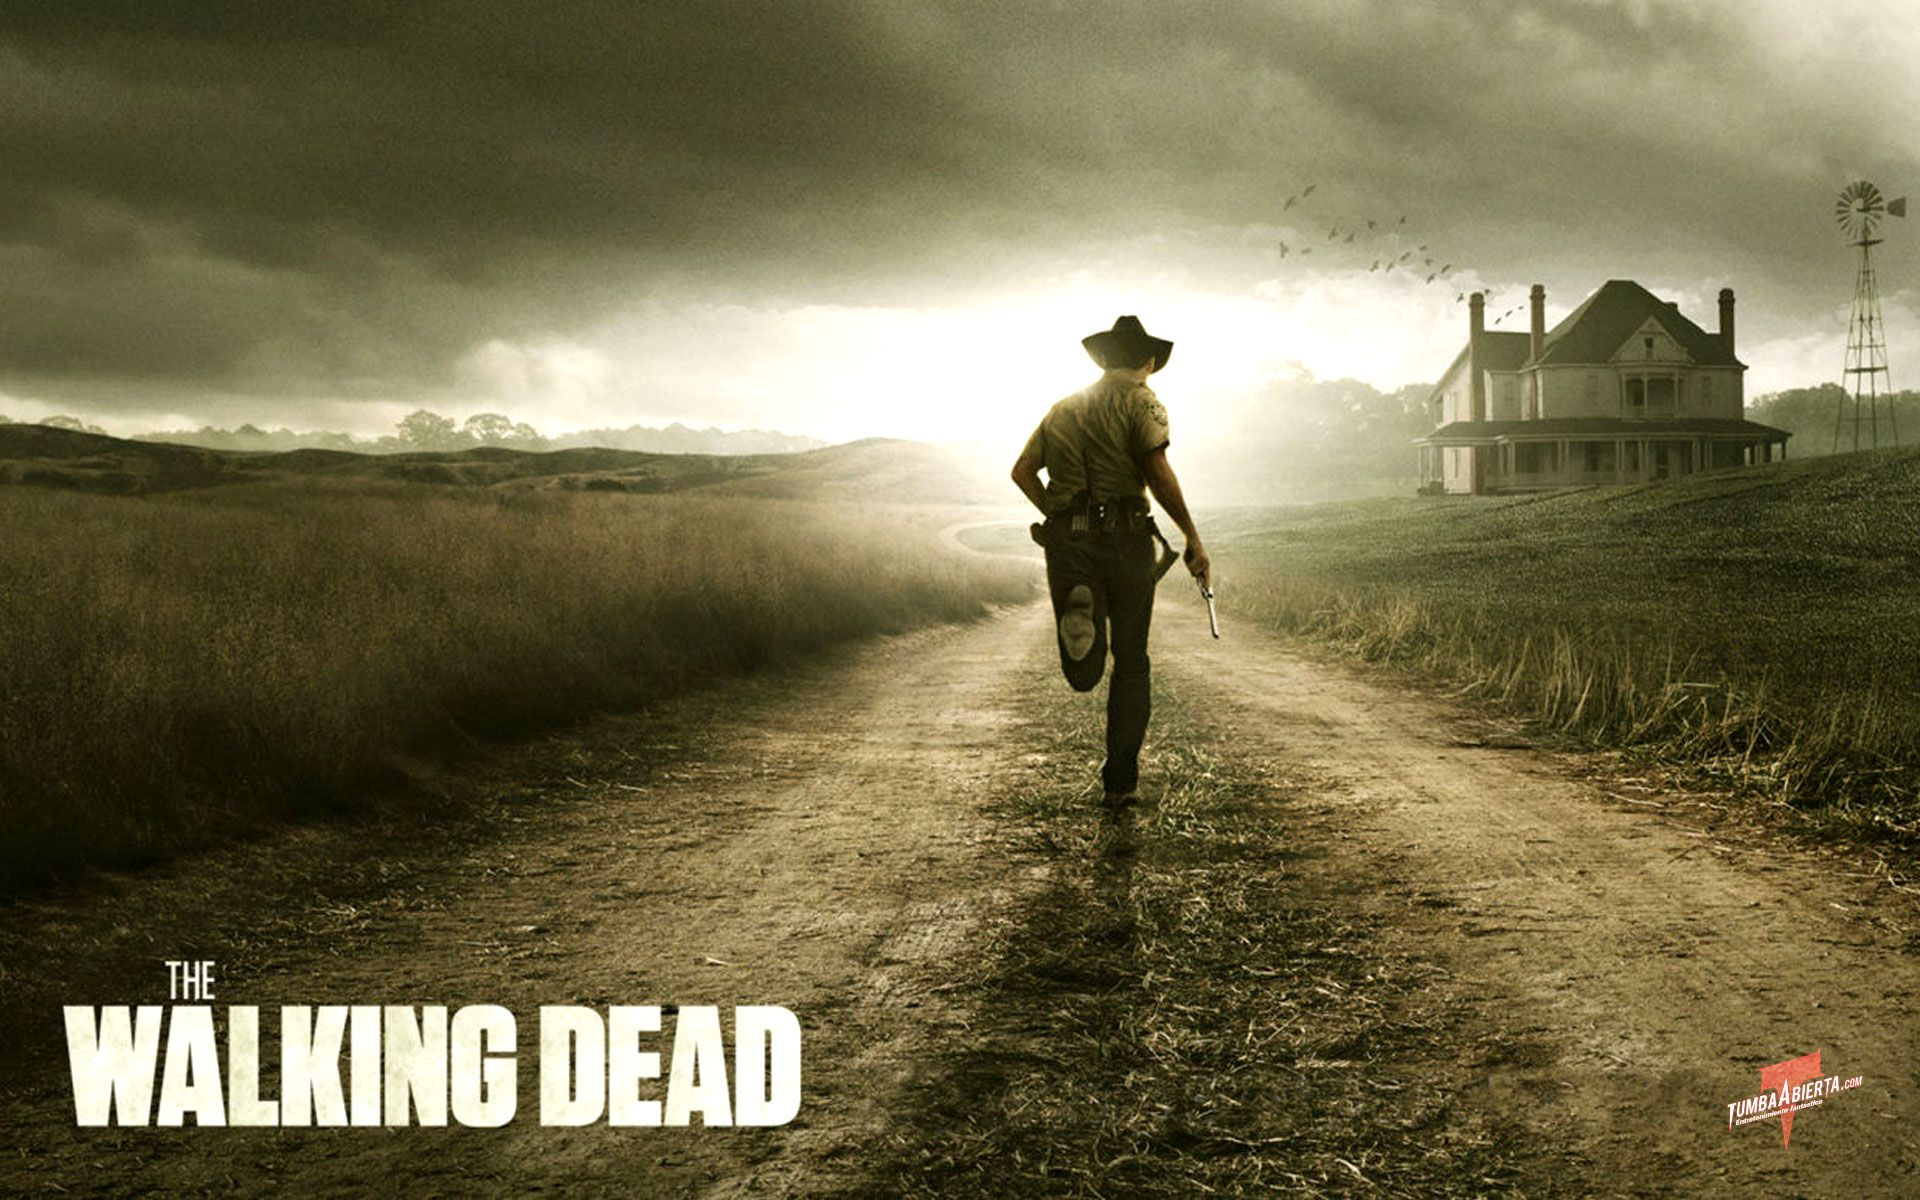 The Walking Dead The Walking Dead Poster Walking Dead Wallpaper